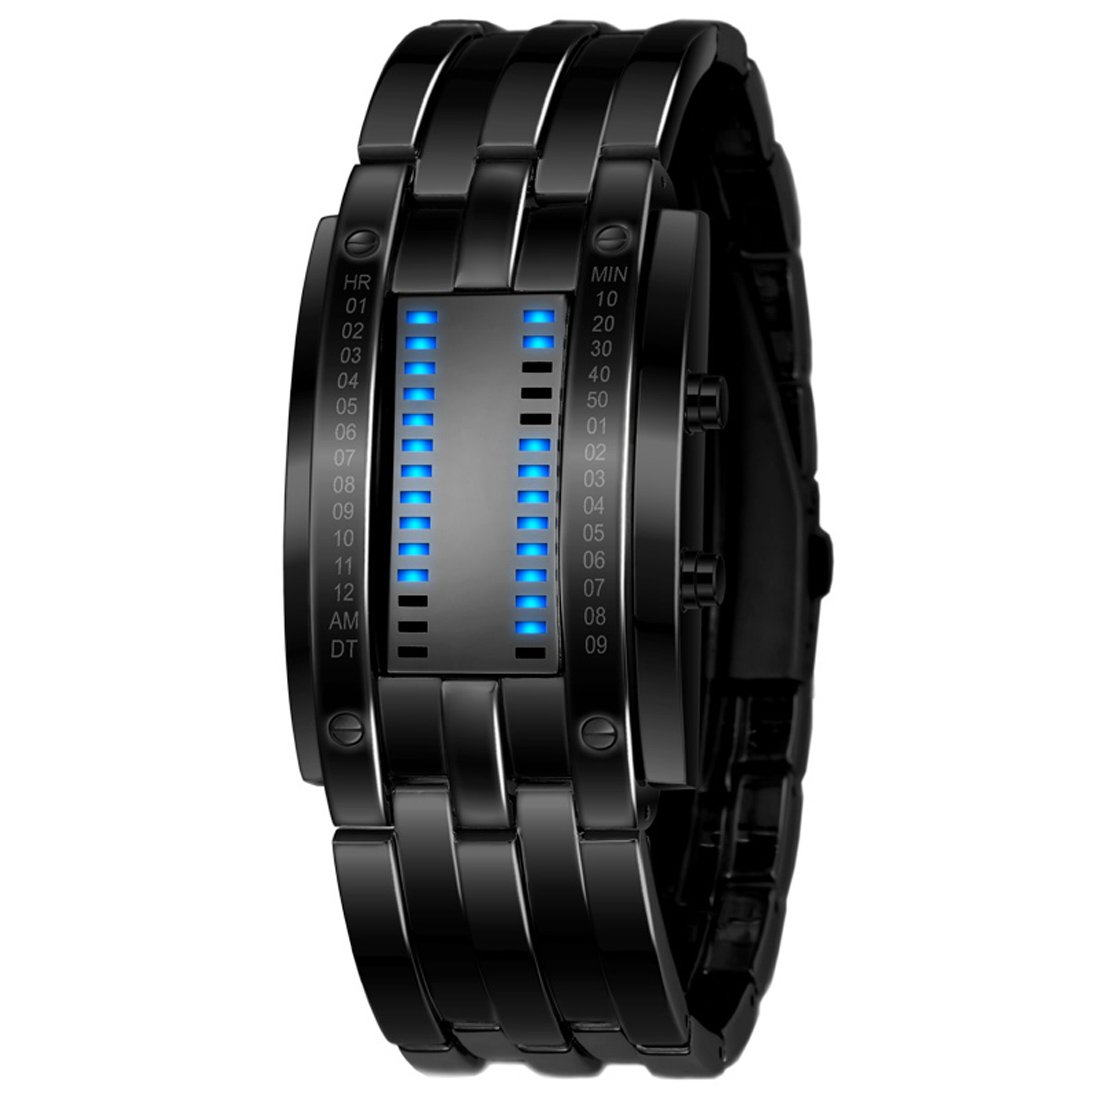 Gets Unisex Binary Watch Unique Led Illuminator Wrist Watches Creative Stainless Steel Sports Watch (Black-6.7 inch,6.7 inch)